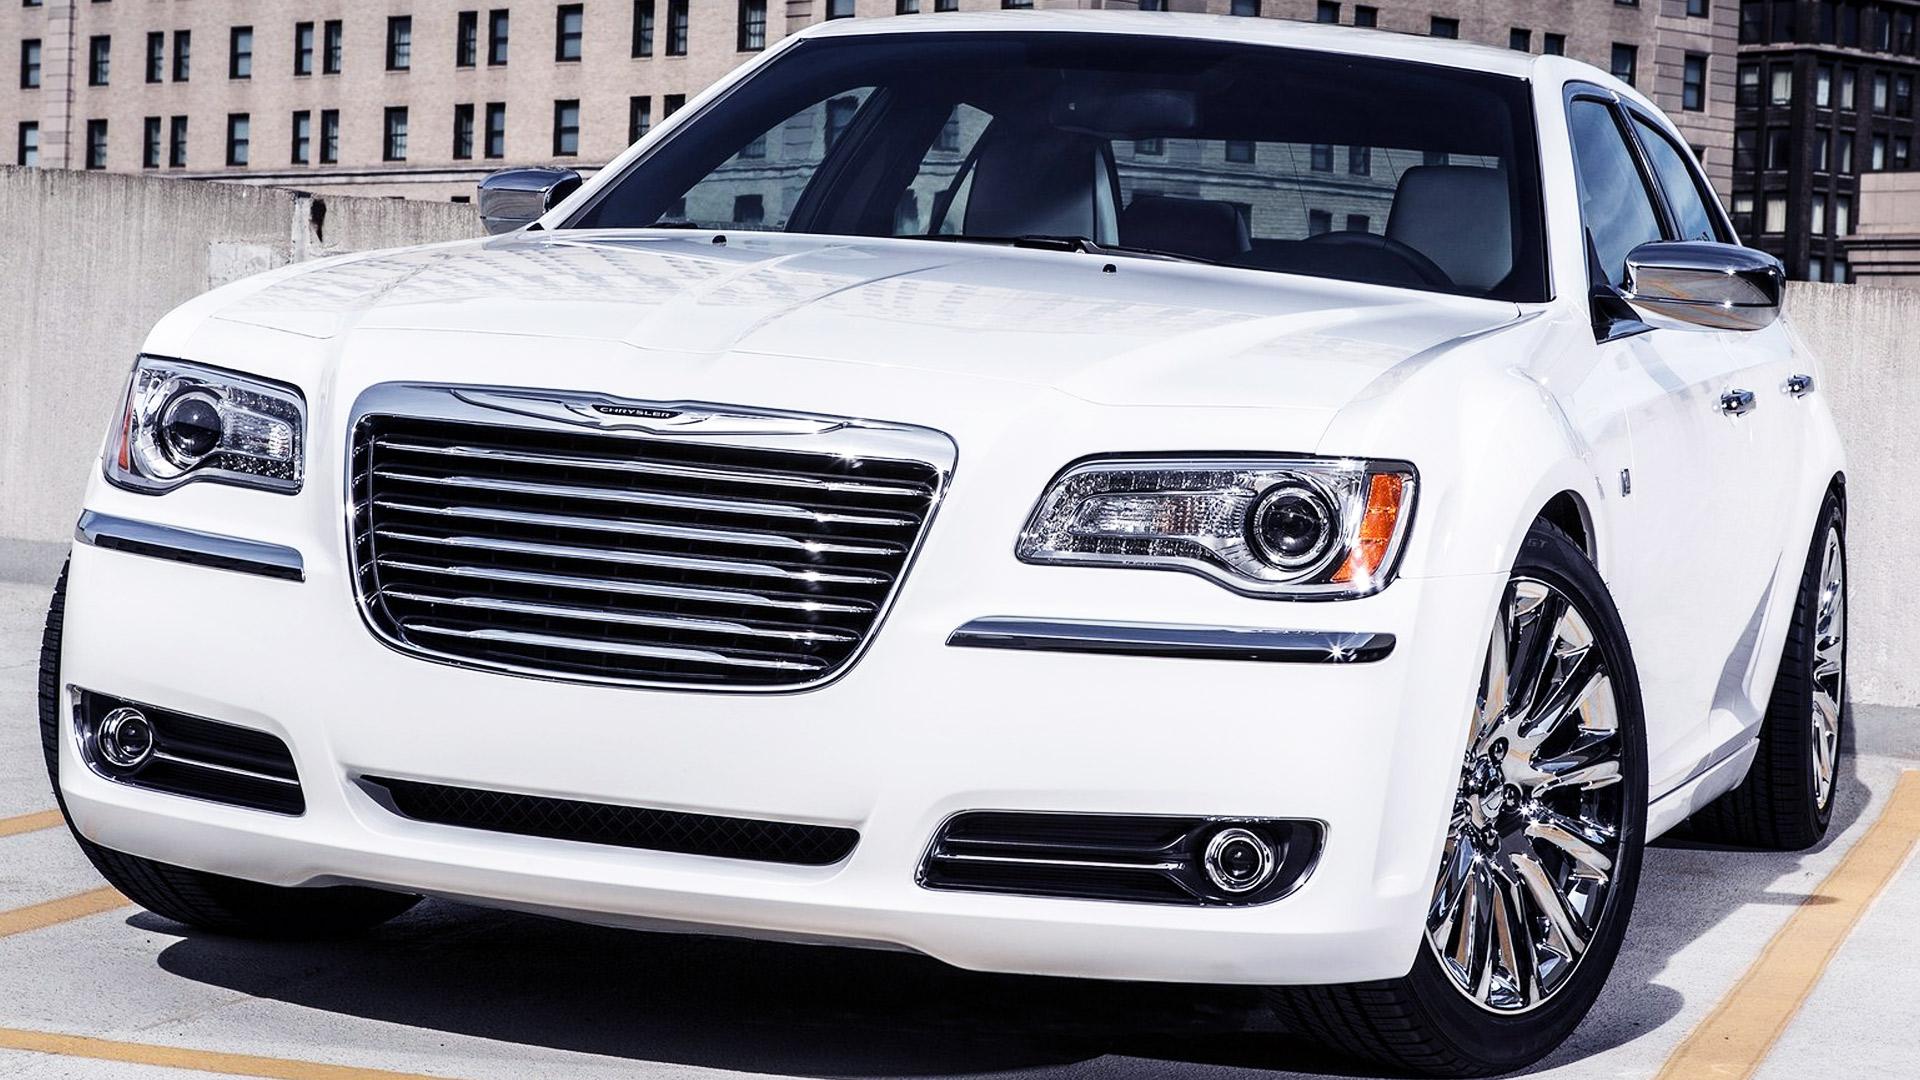 Download   2013 Chrysler 300 HD Wallpaper